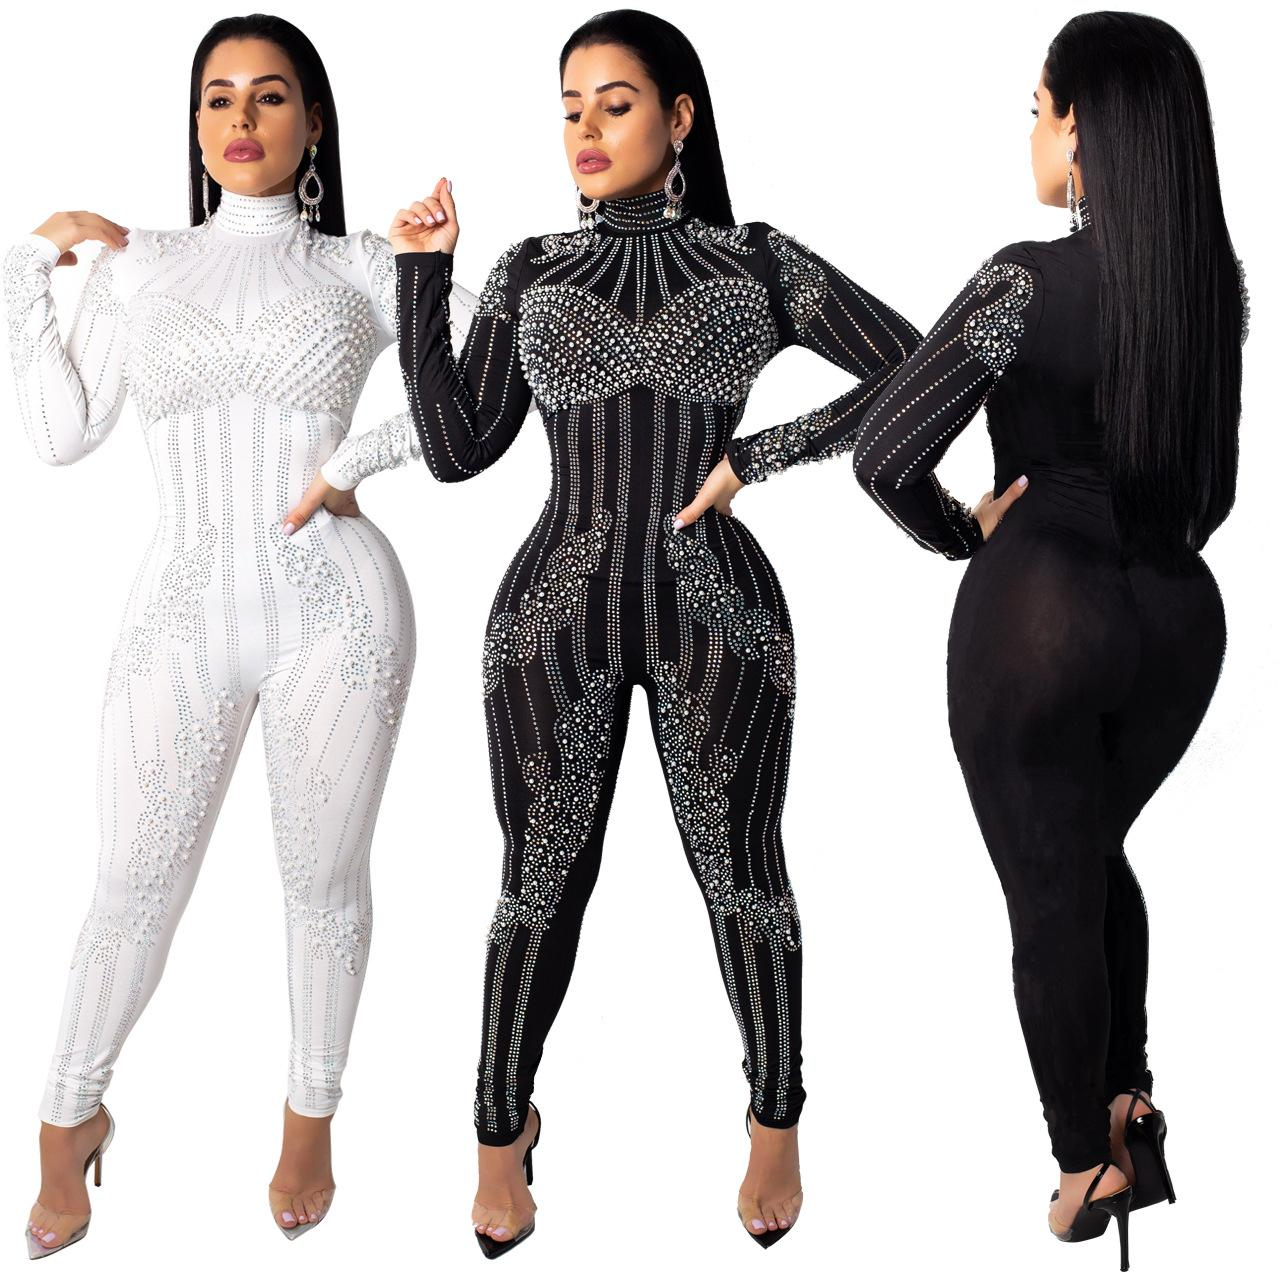 Black White Pearls Diamonds Mesh Jumpsuit Turtleneck Long Sleeve Women Romper Bar Night Club Performance Party Overalls Playsuits